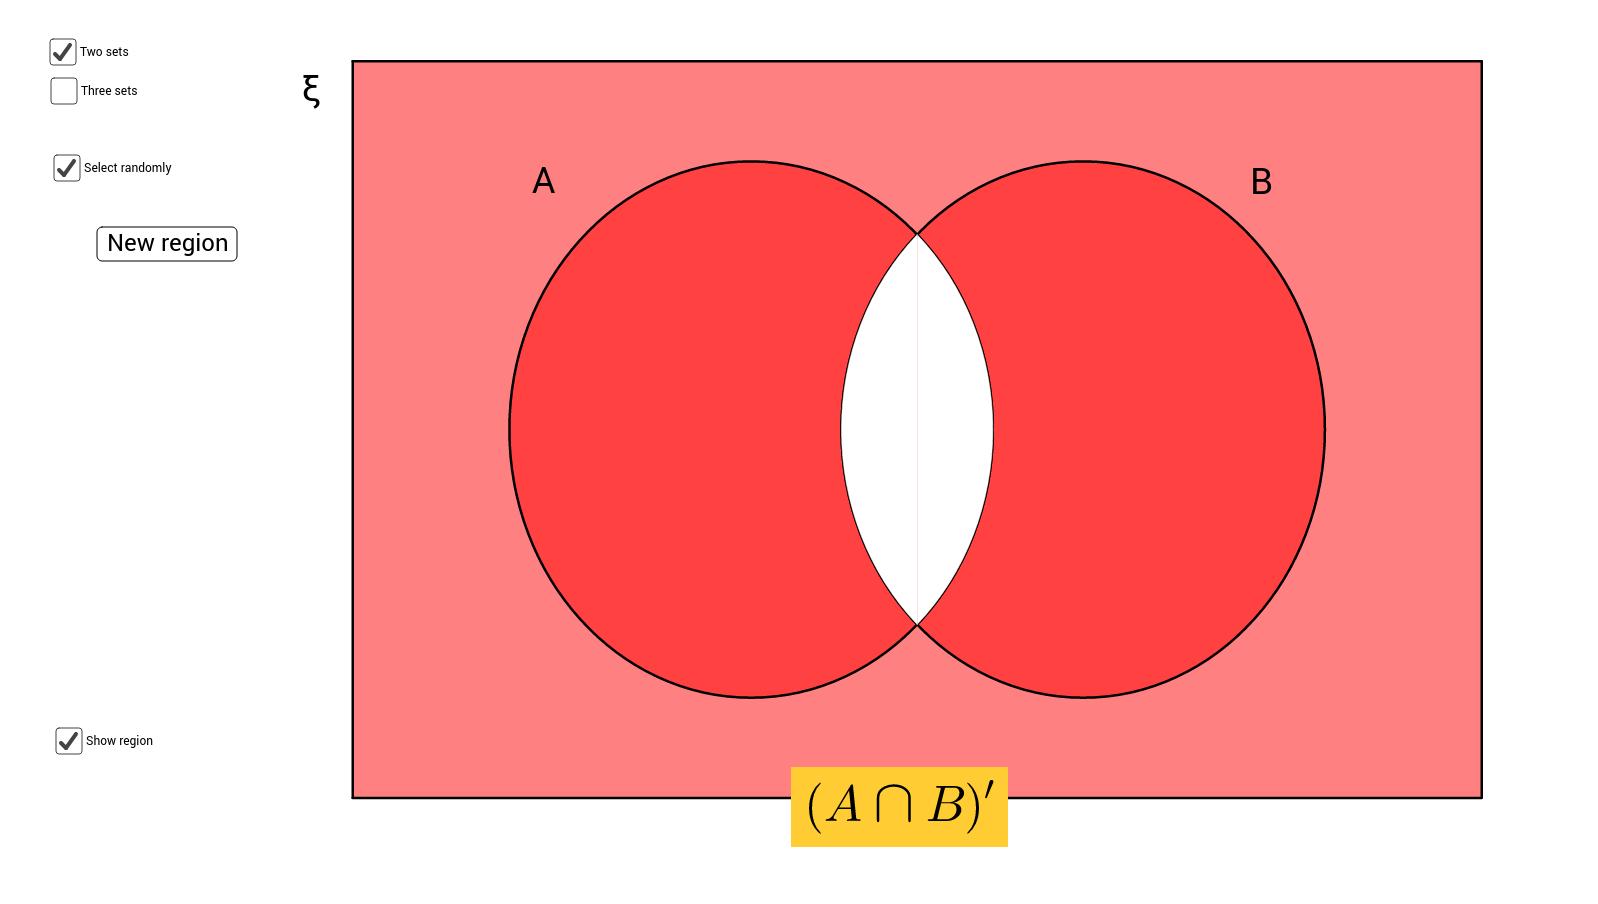 Venn diagram shading with 2 and 3 sets